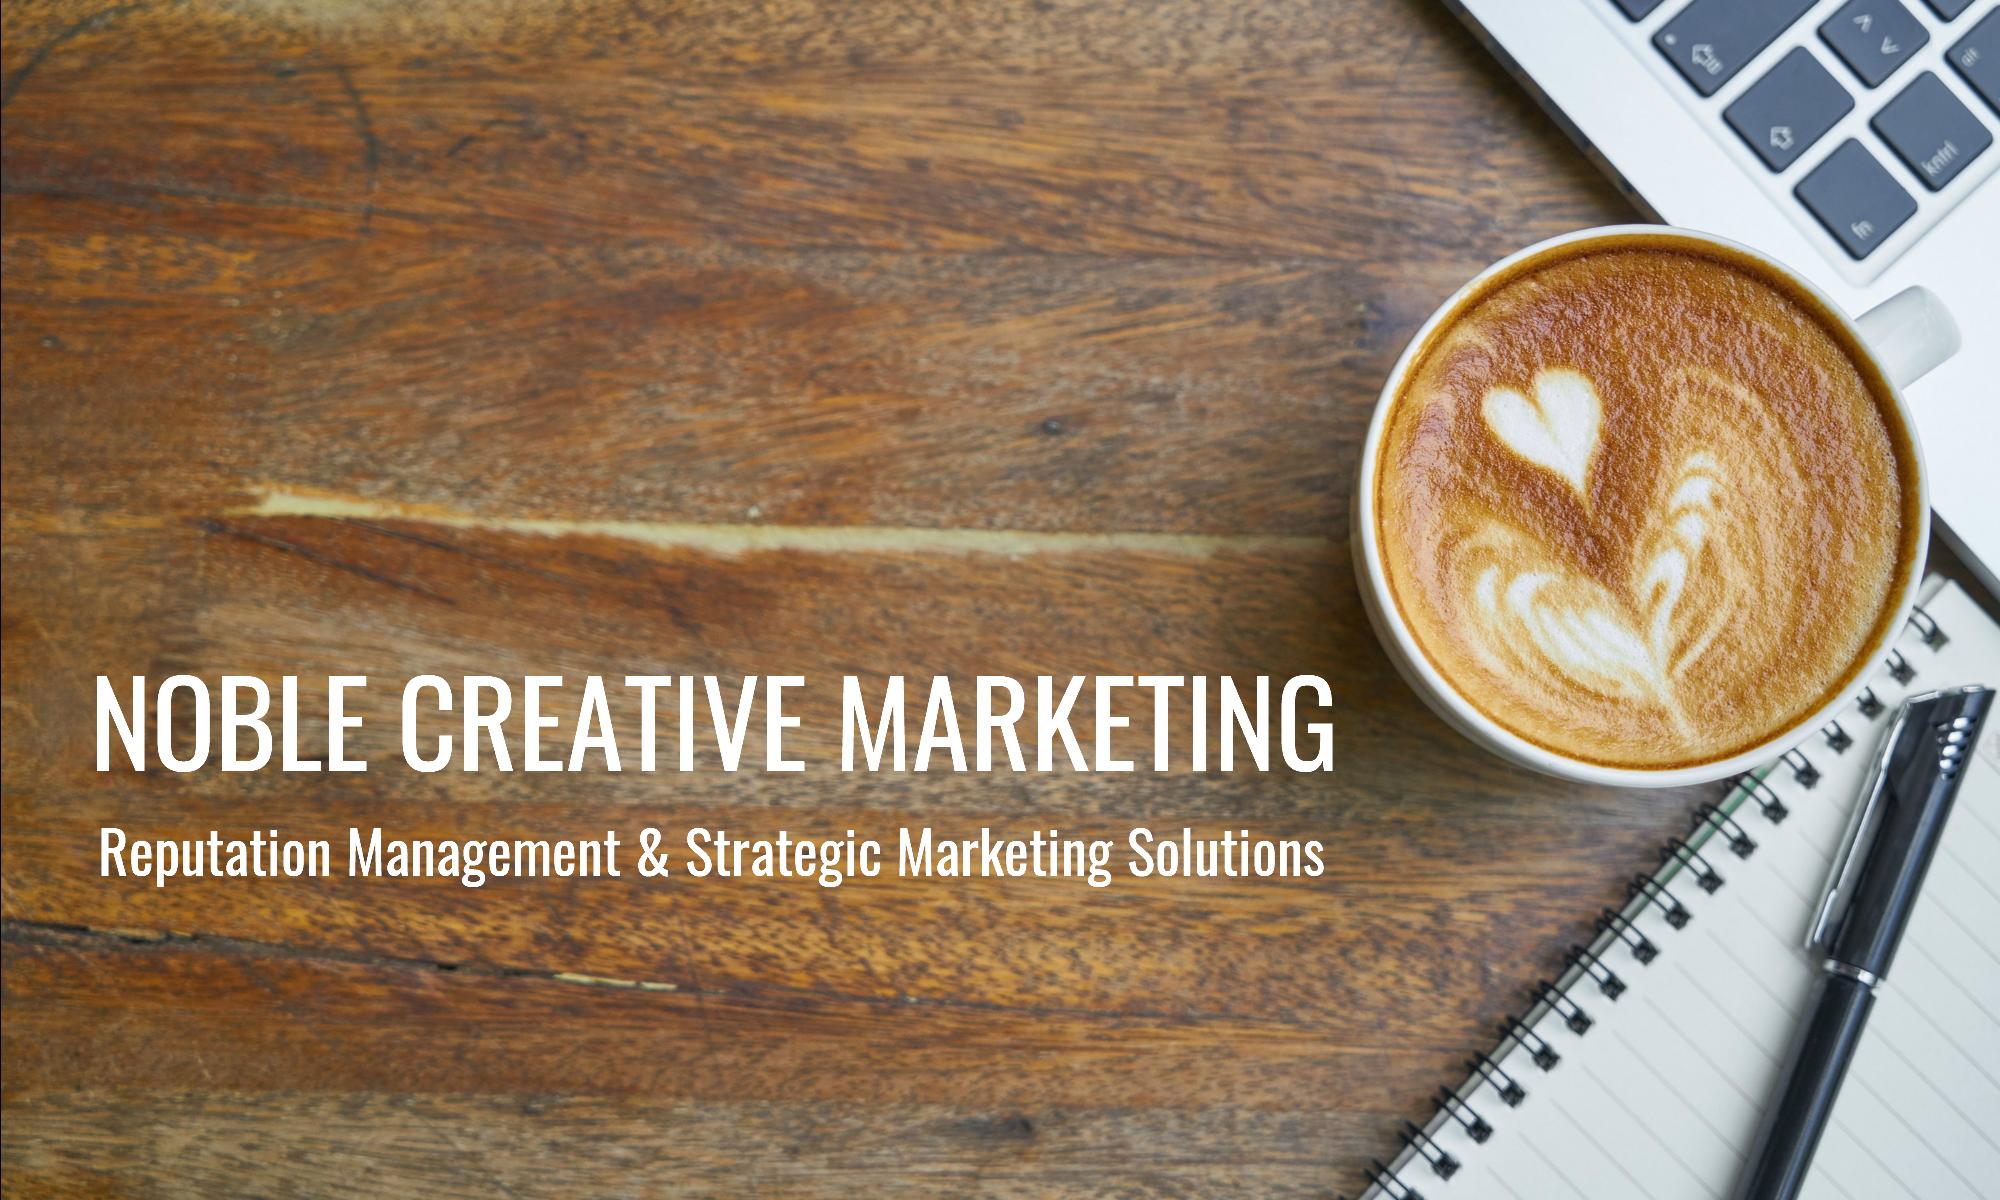 Noble Creative Marketing